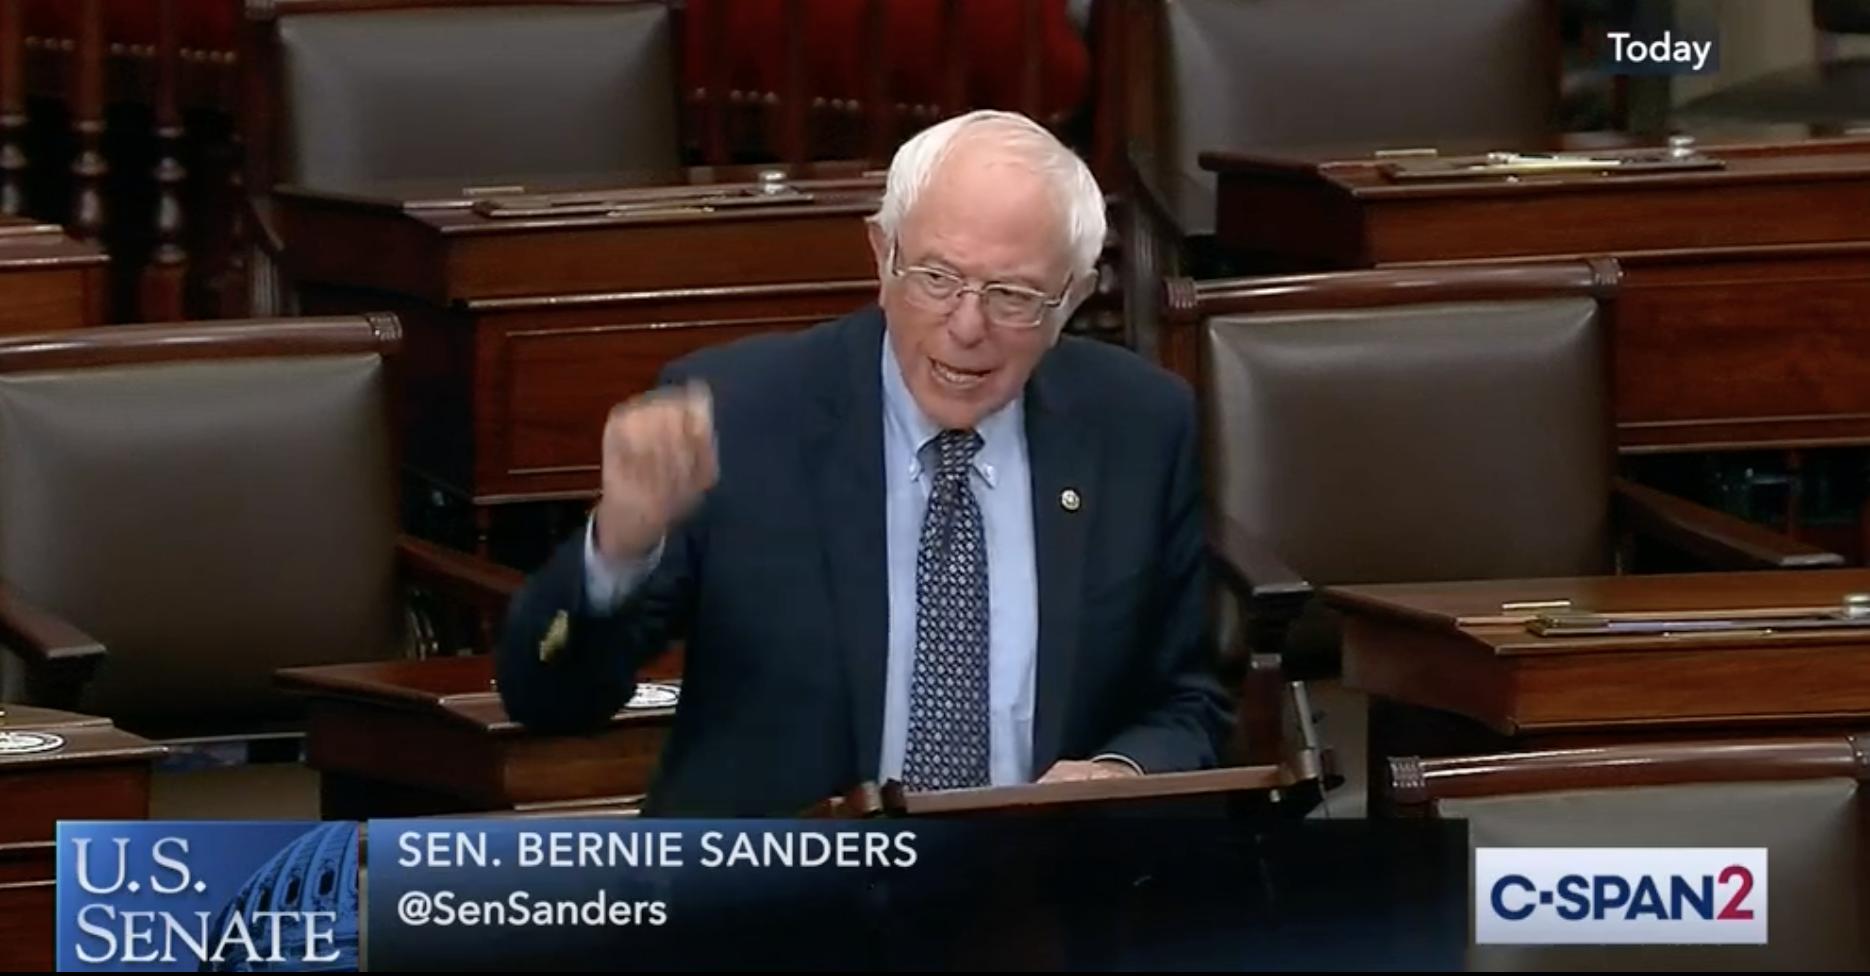 Senate Floor Speech By Bernie Sanders, Marijuana Legalization To Jumpstart Policing Reform